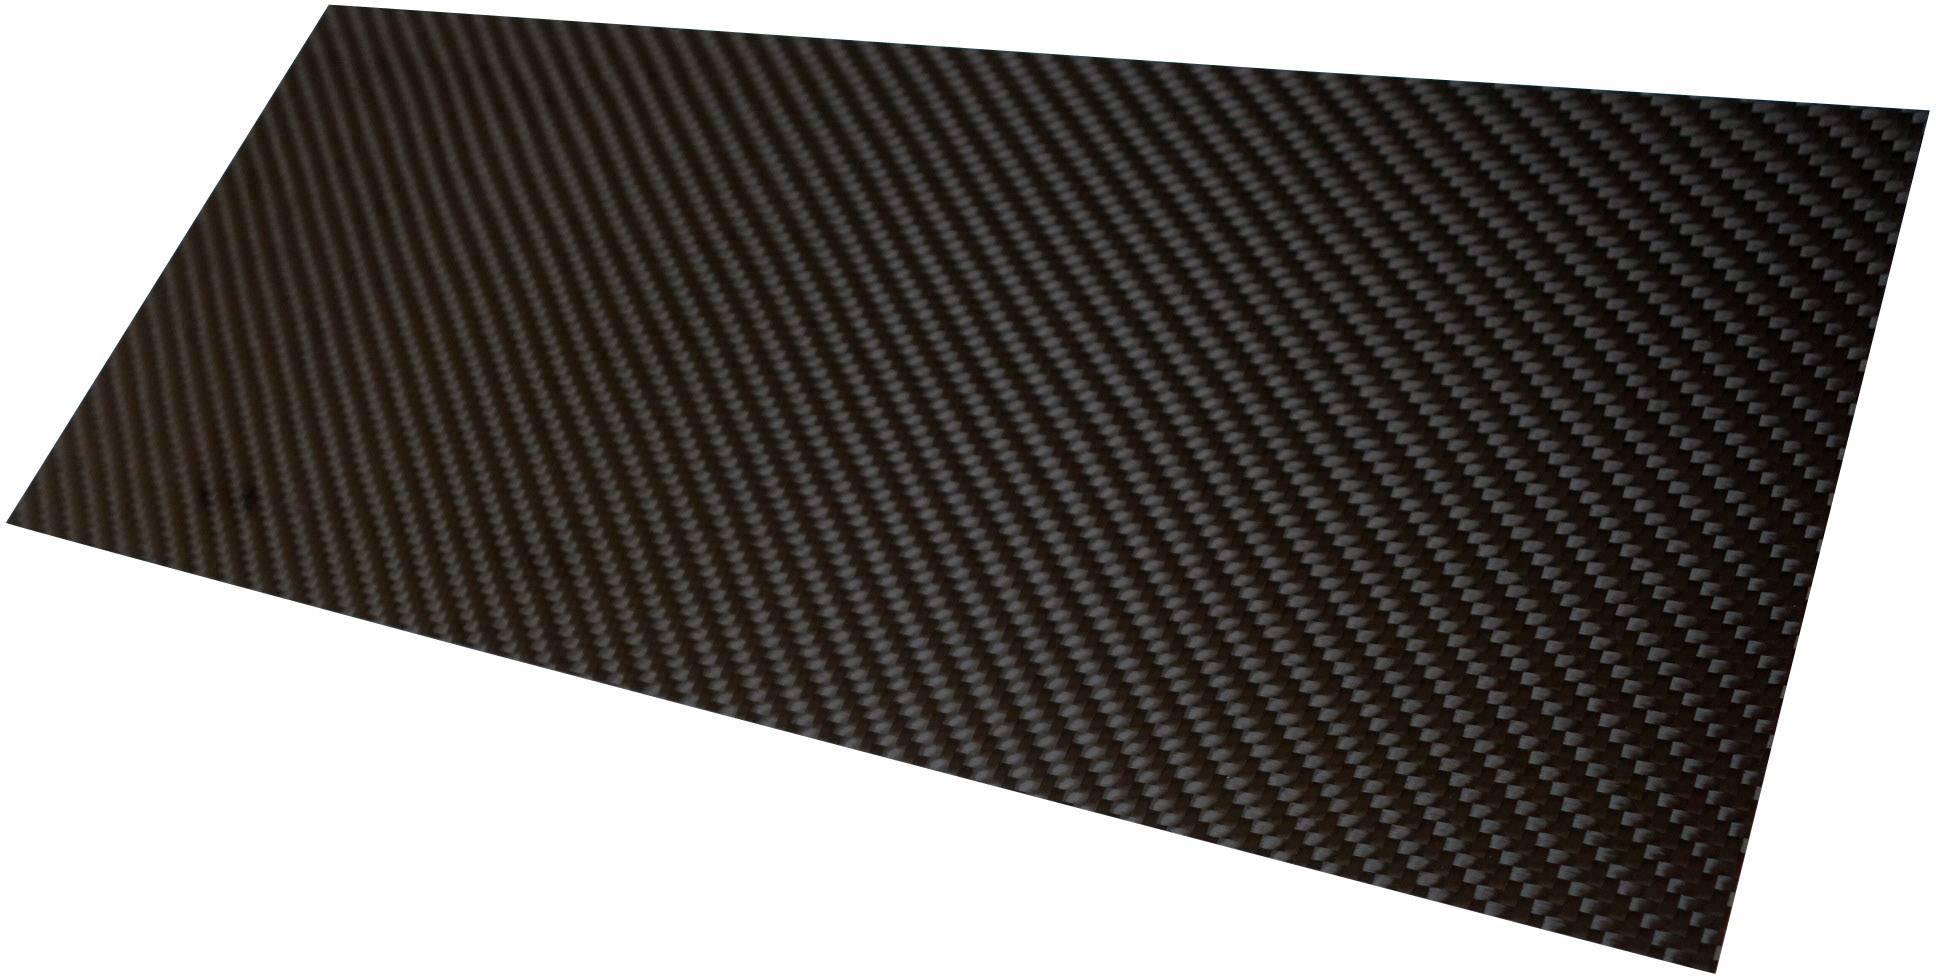 Doska z karbónových vlákien Carbotec CFK-PLATTE 2MM, (d x š) 350 mm x 150 mm x 2 mm